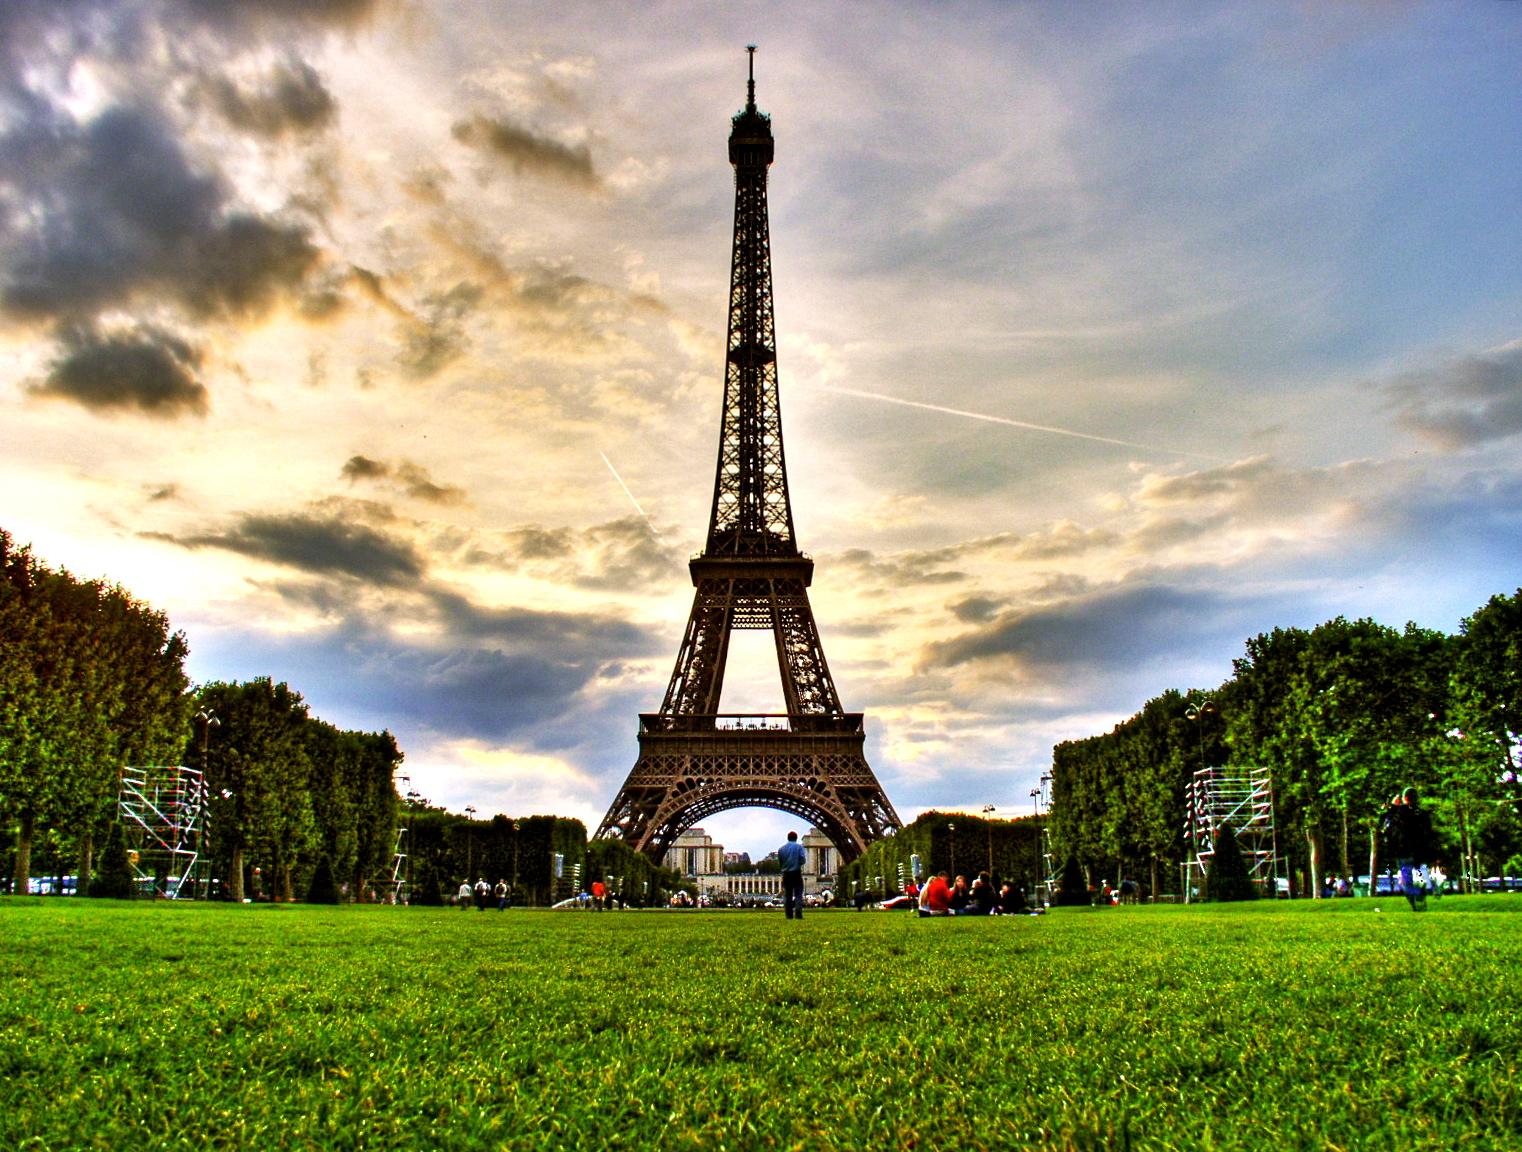 Champ de Mars: Gateway to the Eiffel Tower